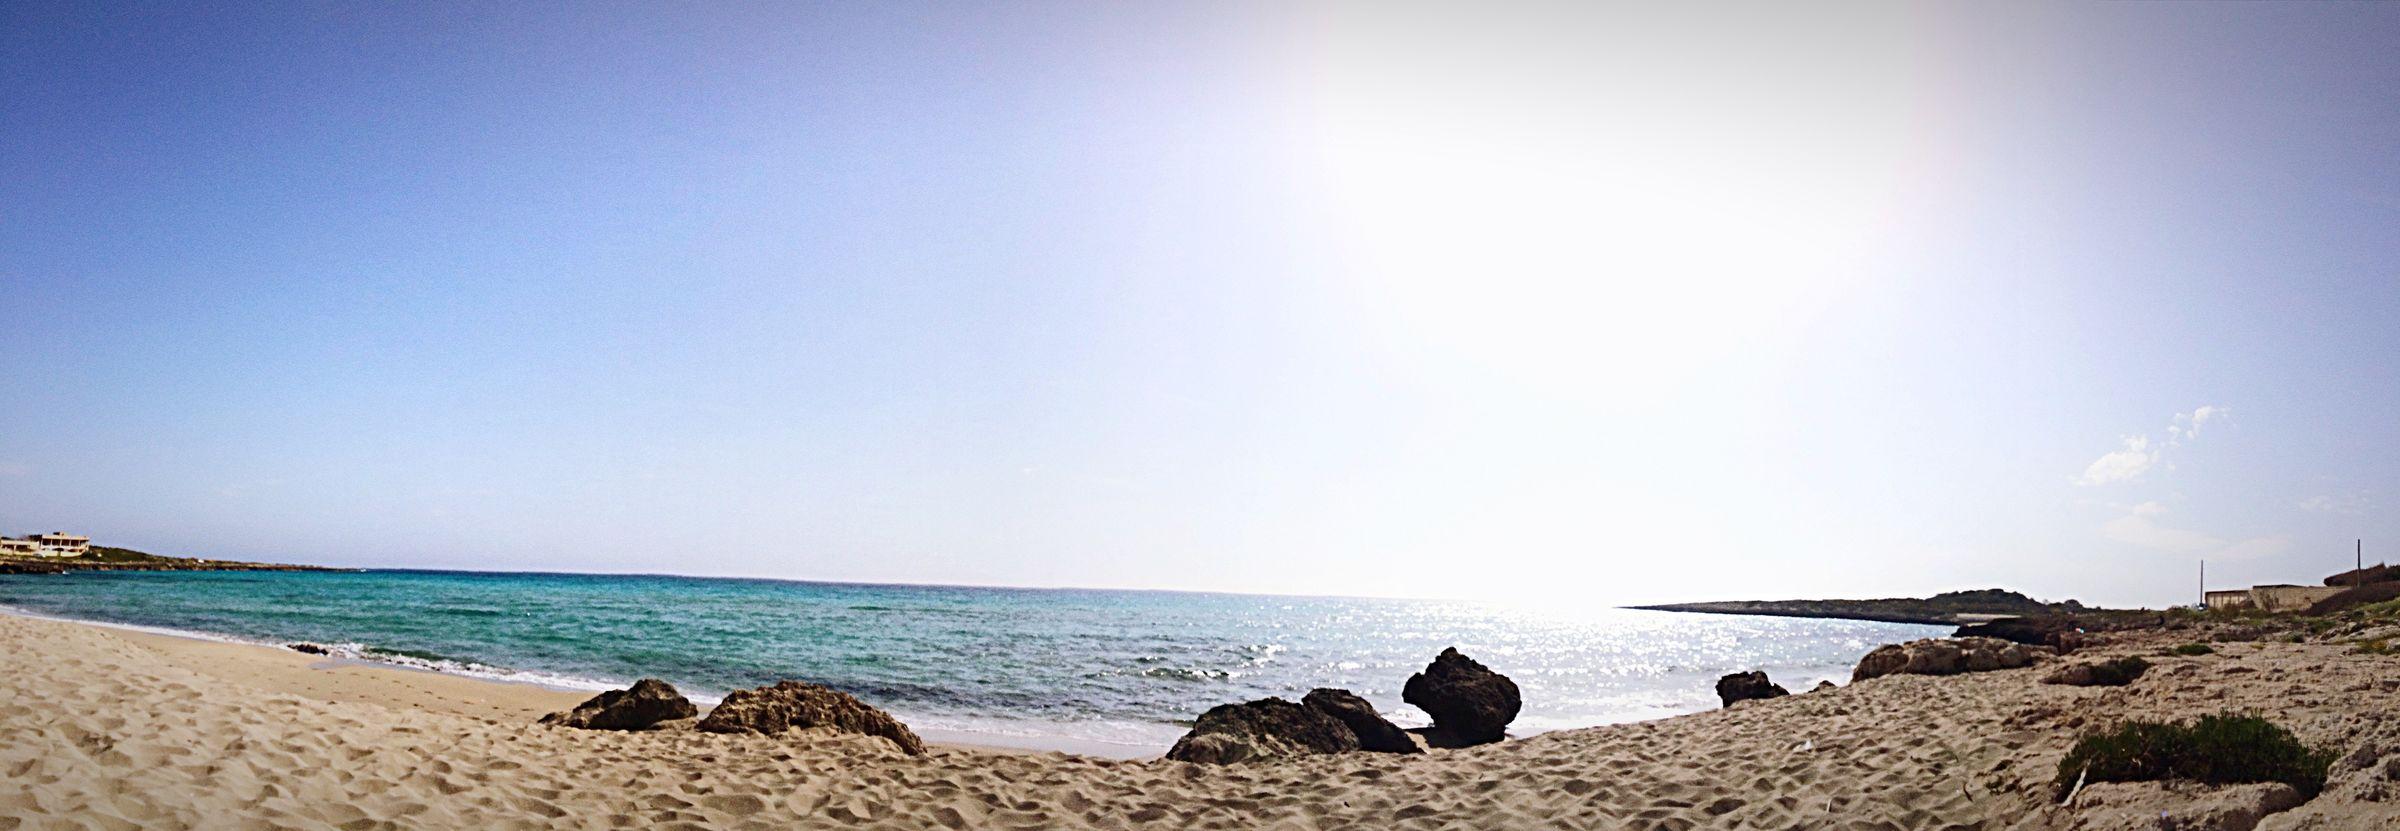 Amazing☀️😍 Sunshine Sea Enjoying The Sun Relaxing Swimming Surfing Sun Spring Fresh Produce Freedom